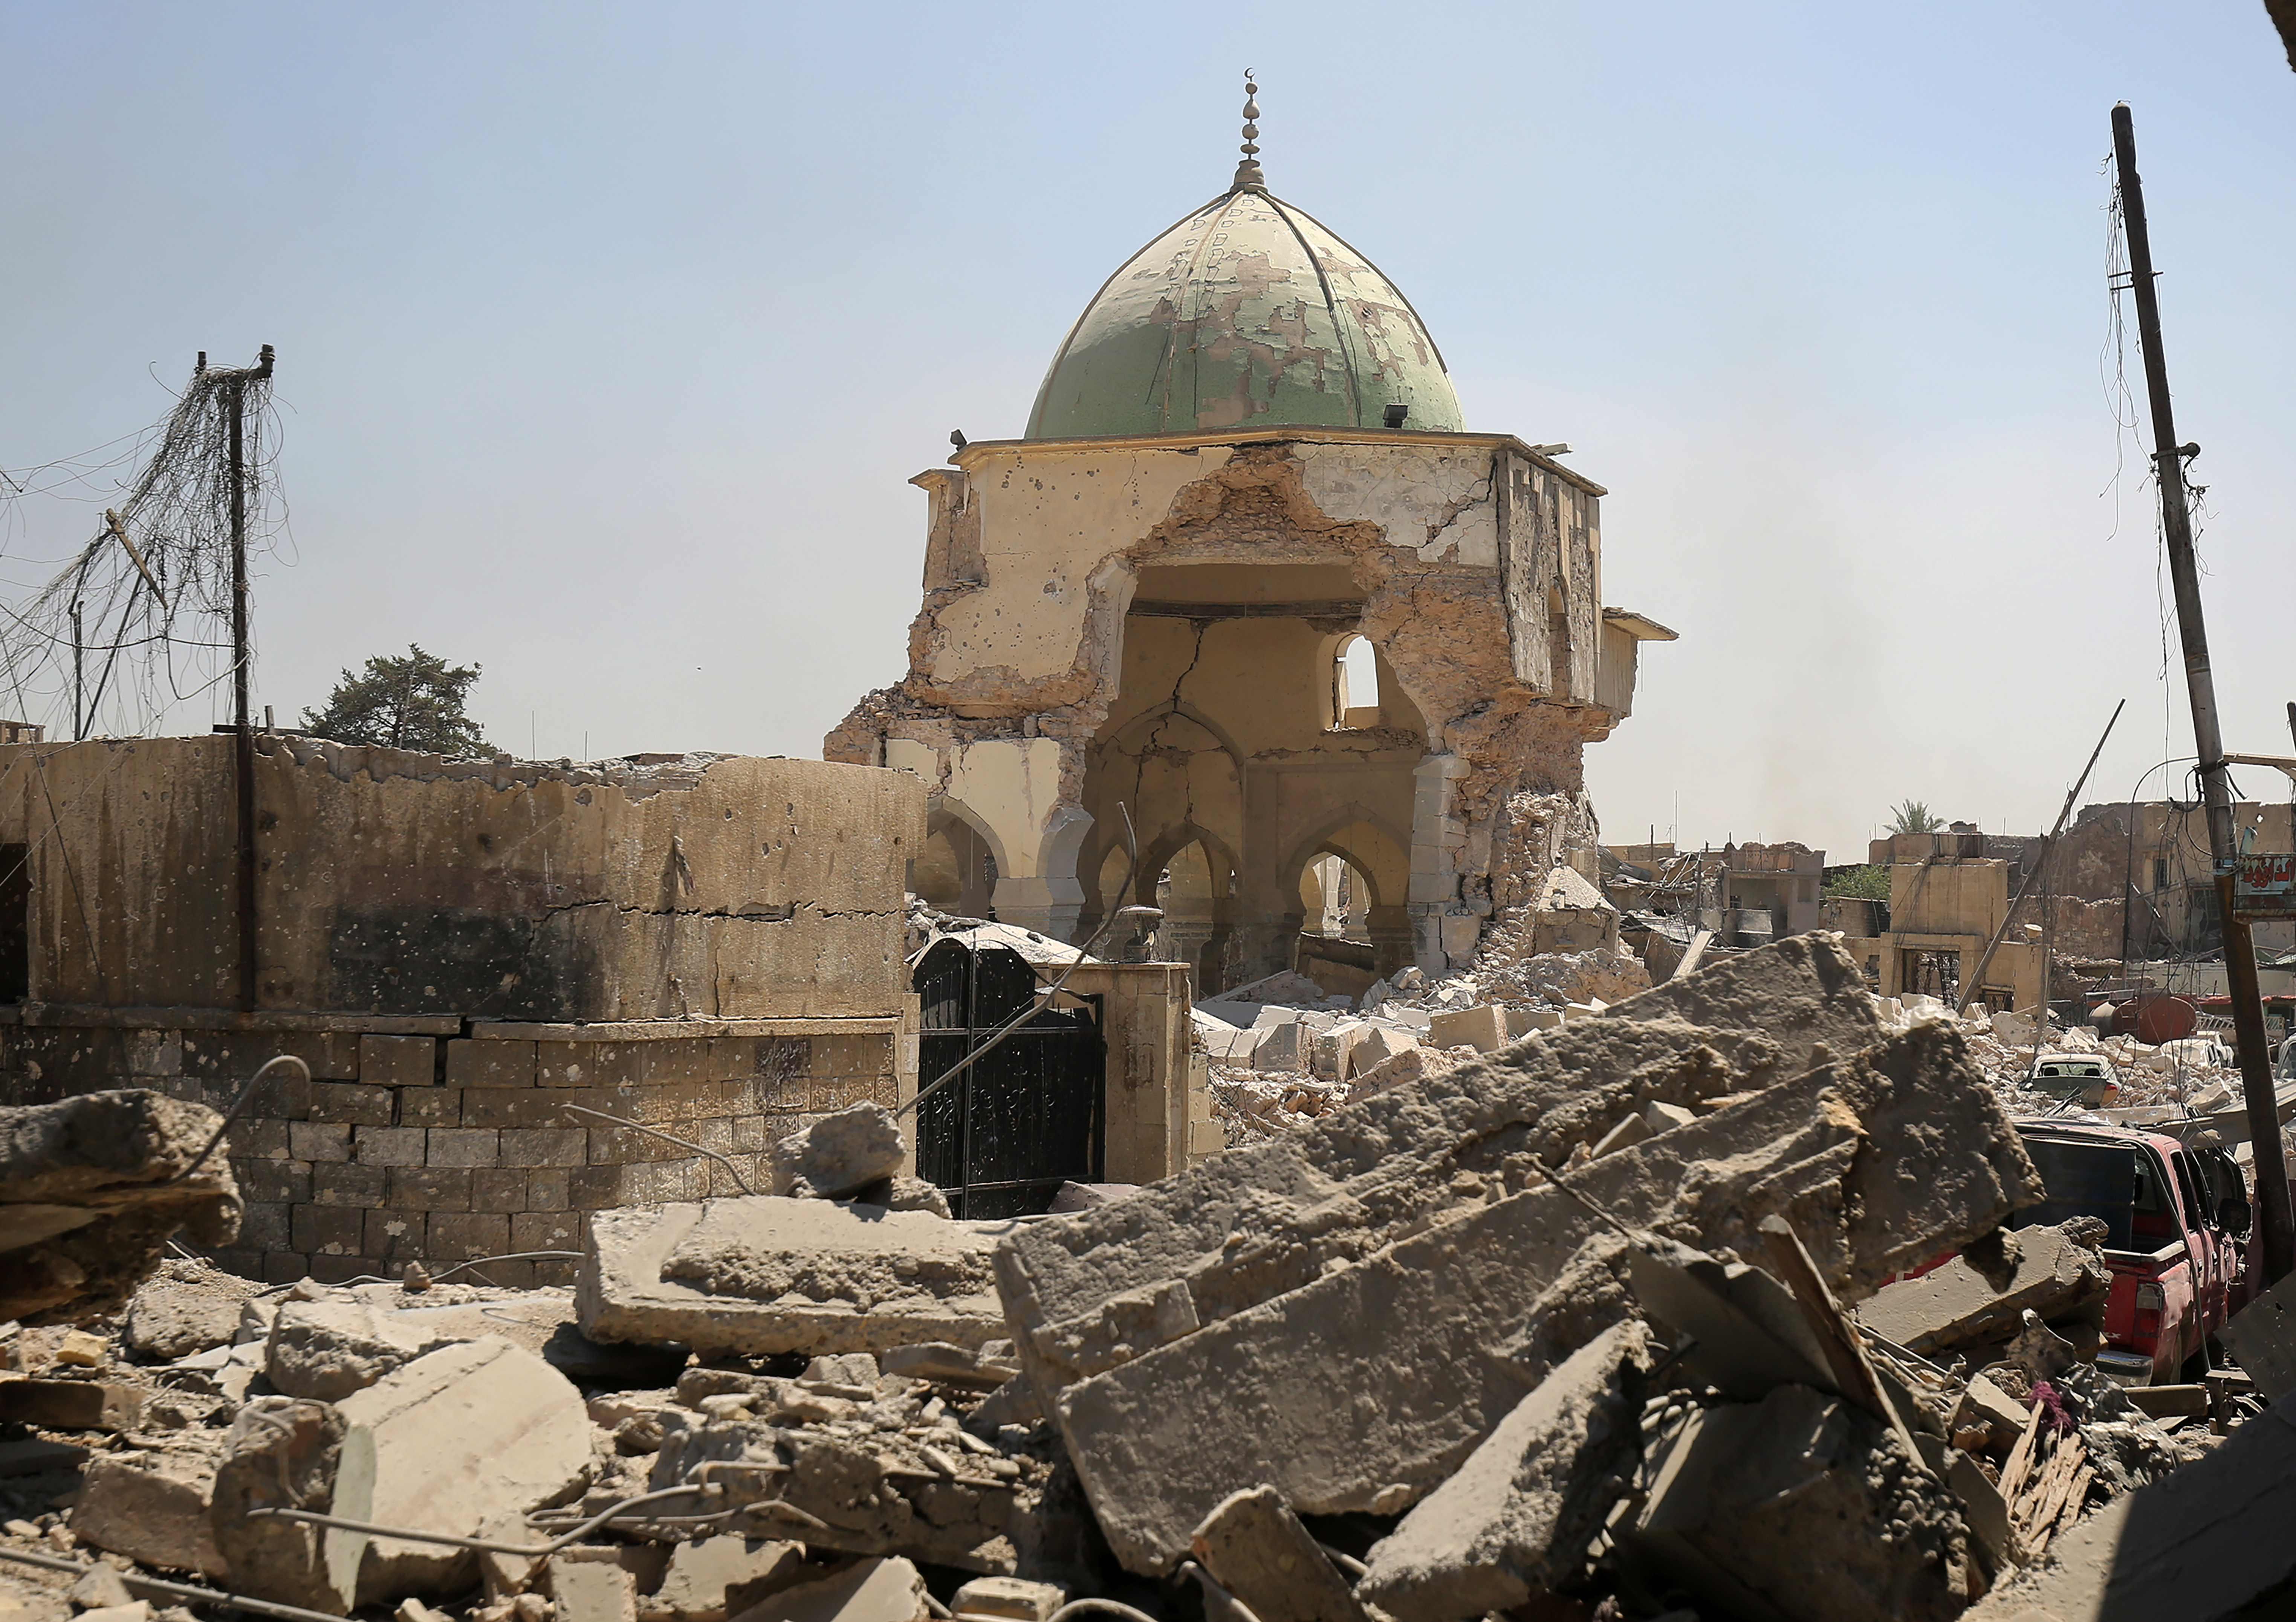 Iraque recupera mesquita onde Estado Islâmico declarou califado